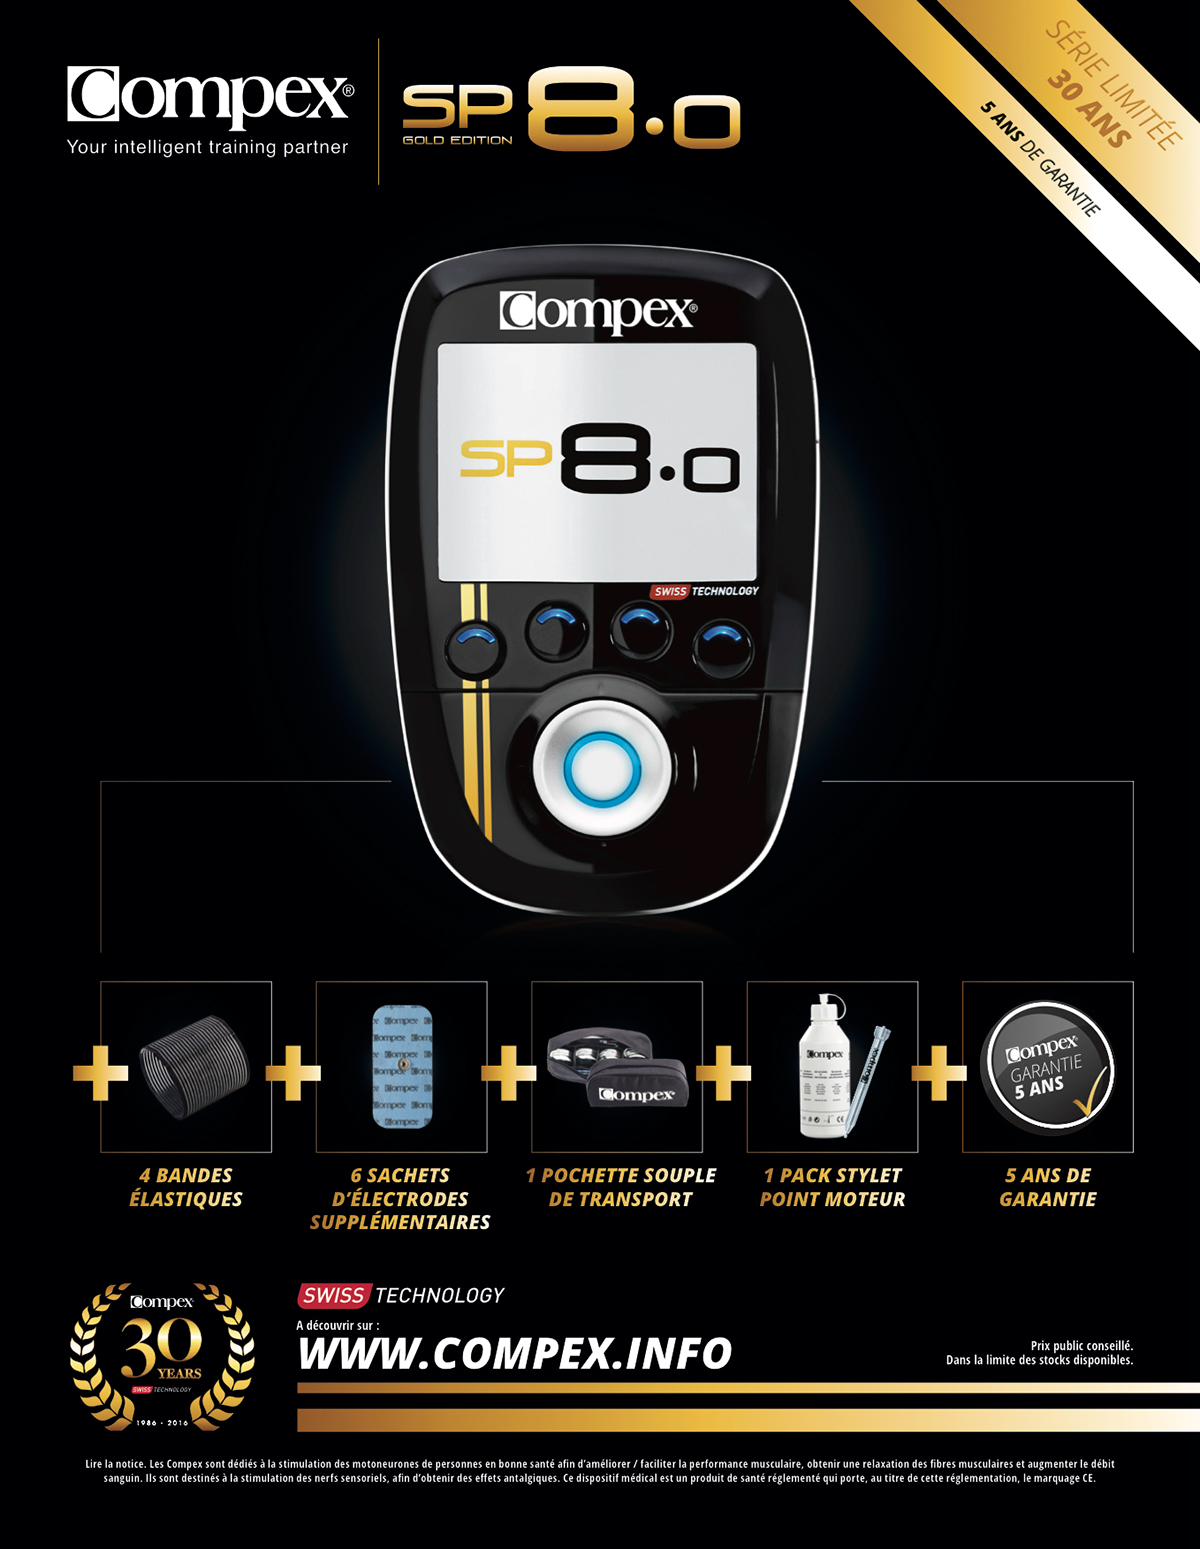 compex sp 8 0 gold edition ad france on behance. Black Bedroom Furniture Sets. Home Design Ideas